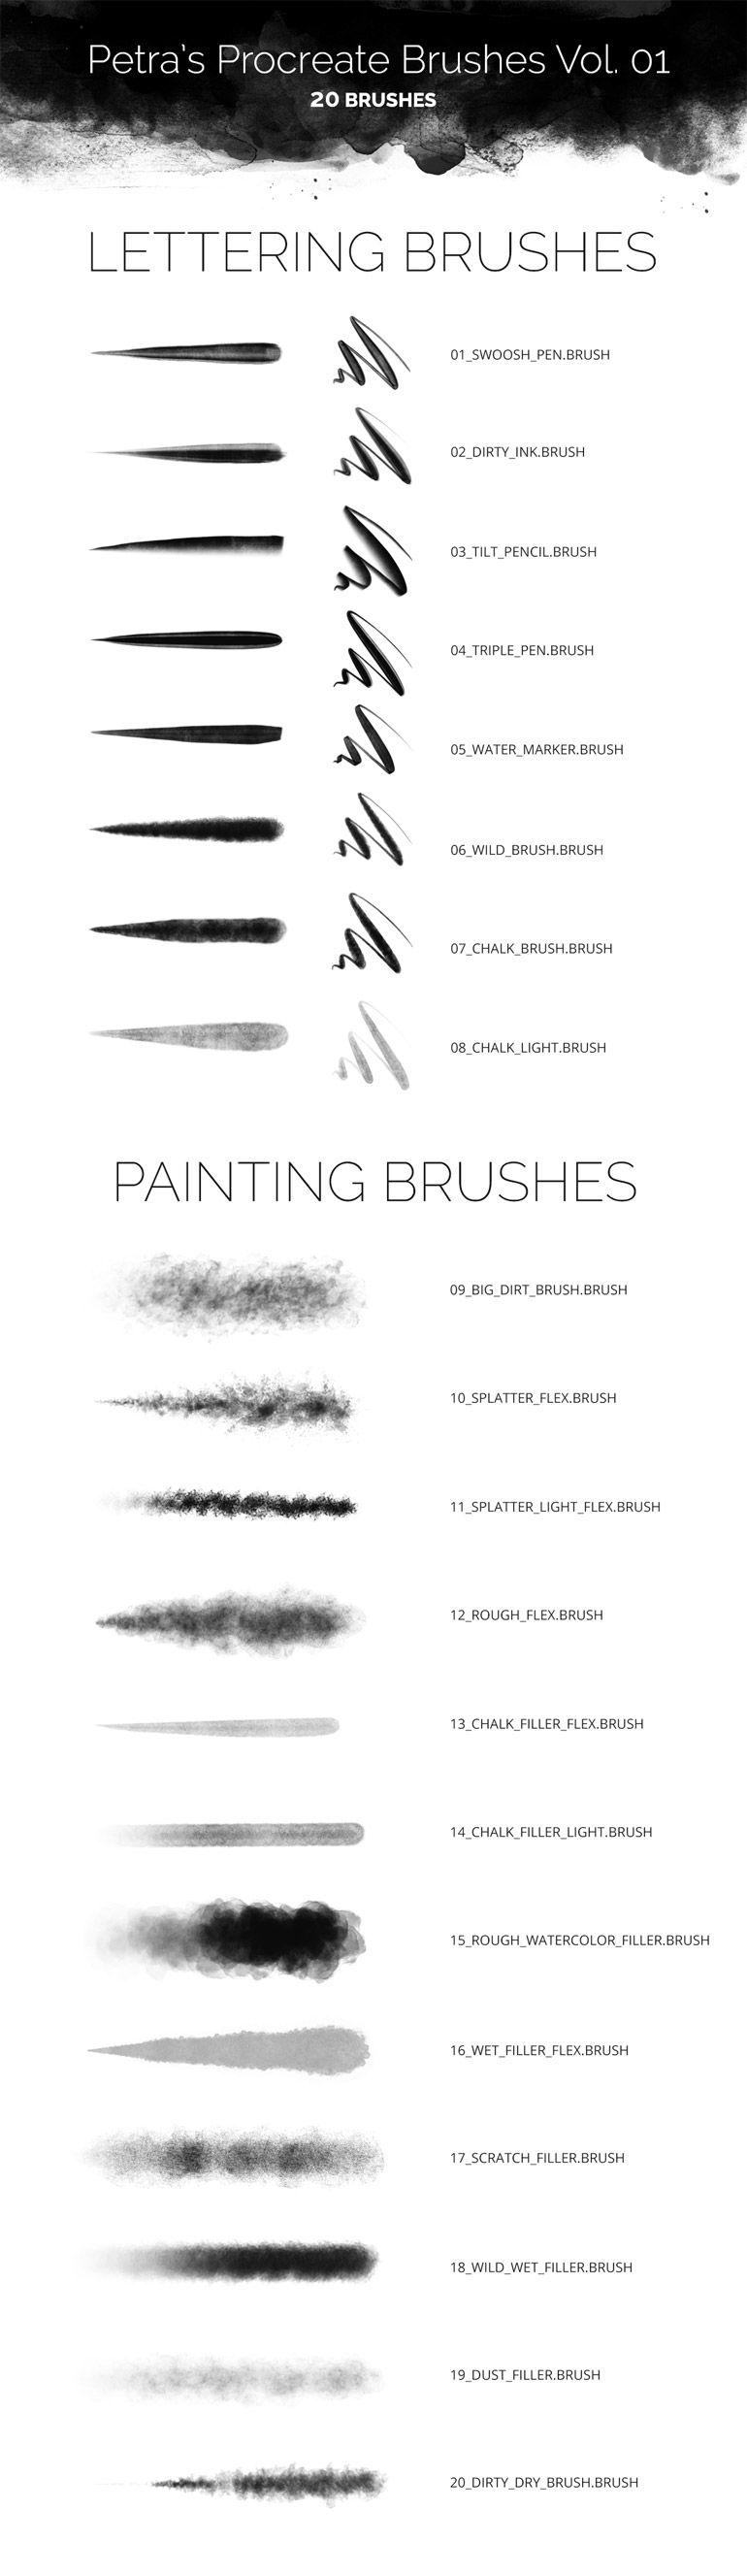 350+ Free Procreate Brushes for the iPad Pro